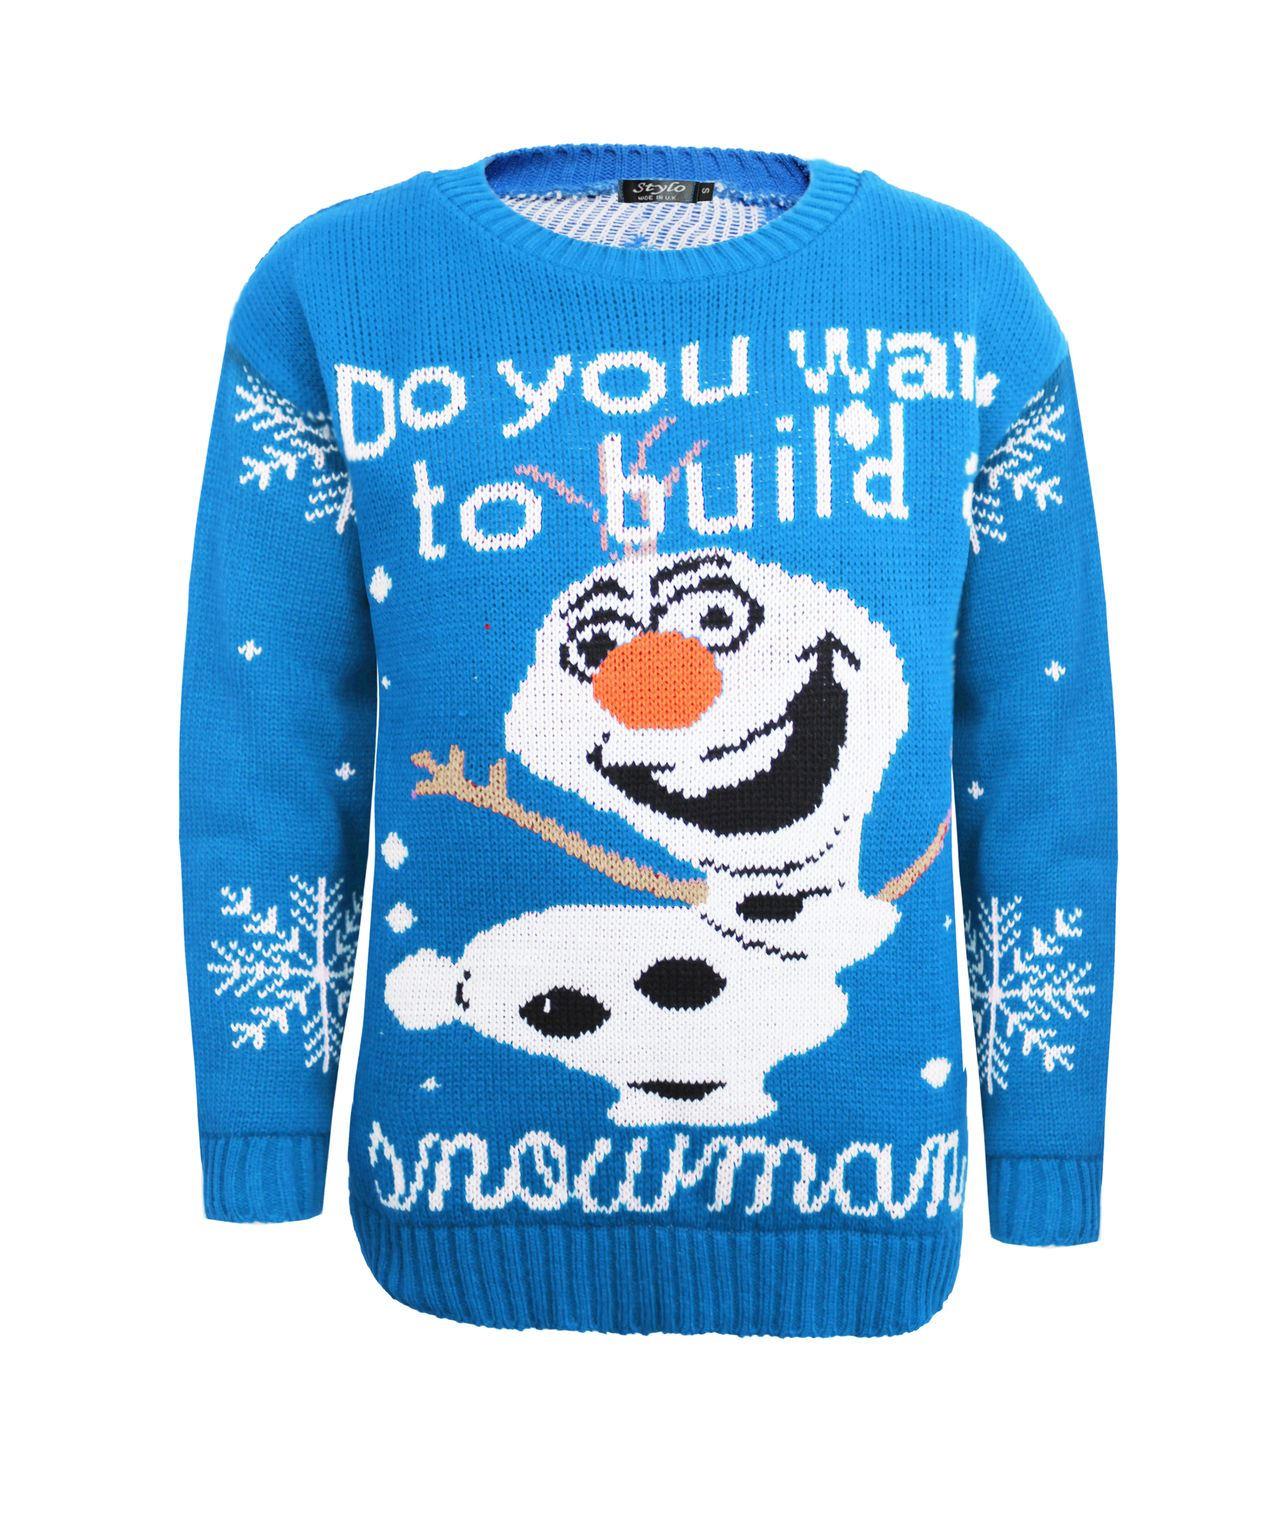 Minion Knitting Pattern Jumper : Kids Boy Girl Knitted Christmas Xmas Olaf Minion Chunky ...